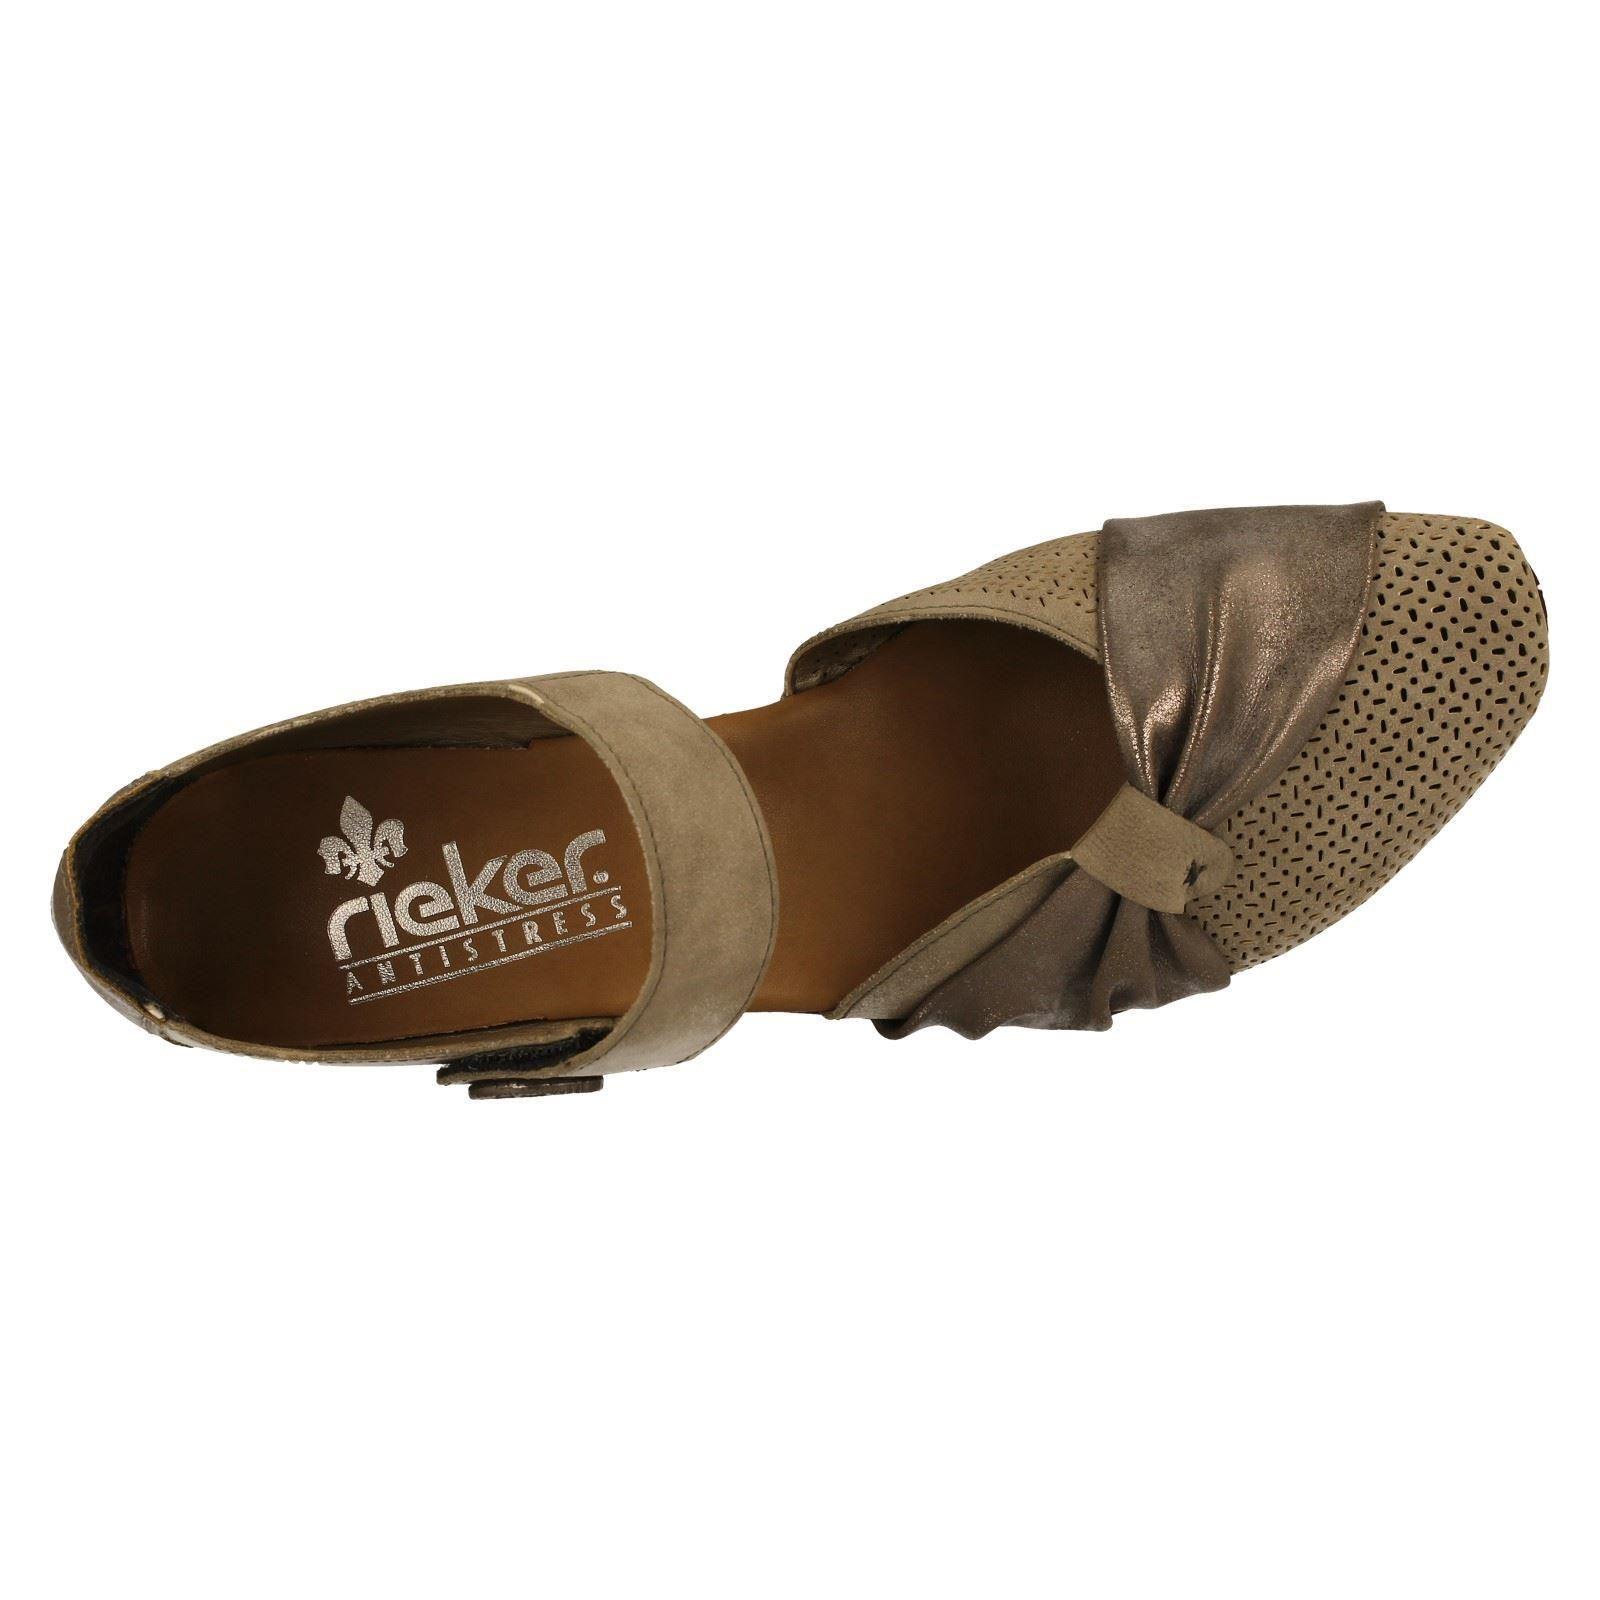 Grey Summer w Ladies The Style 43721 Rieker Shoes SB0WwZqO